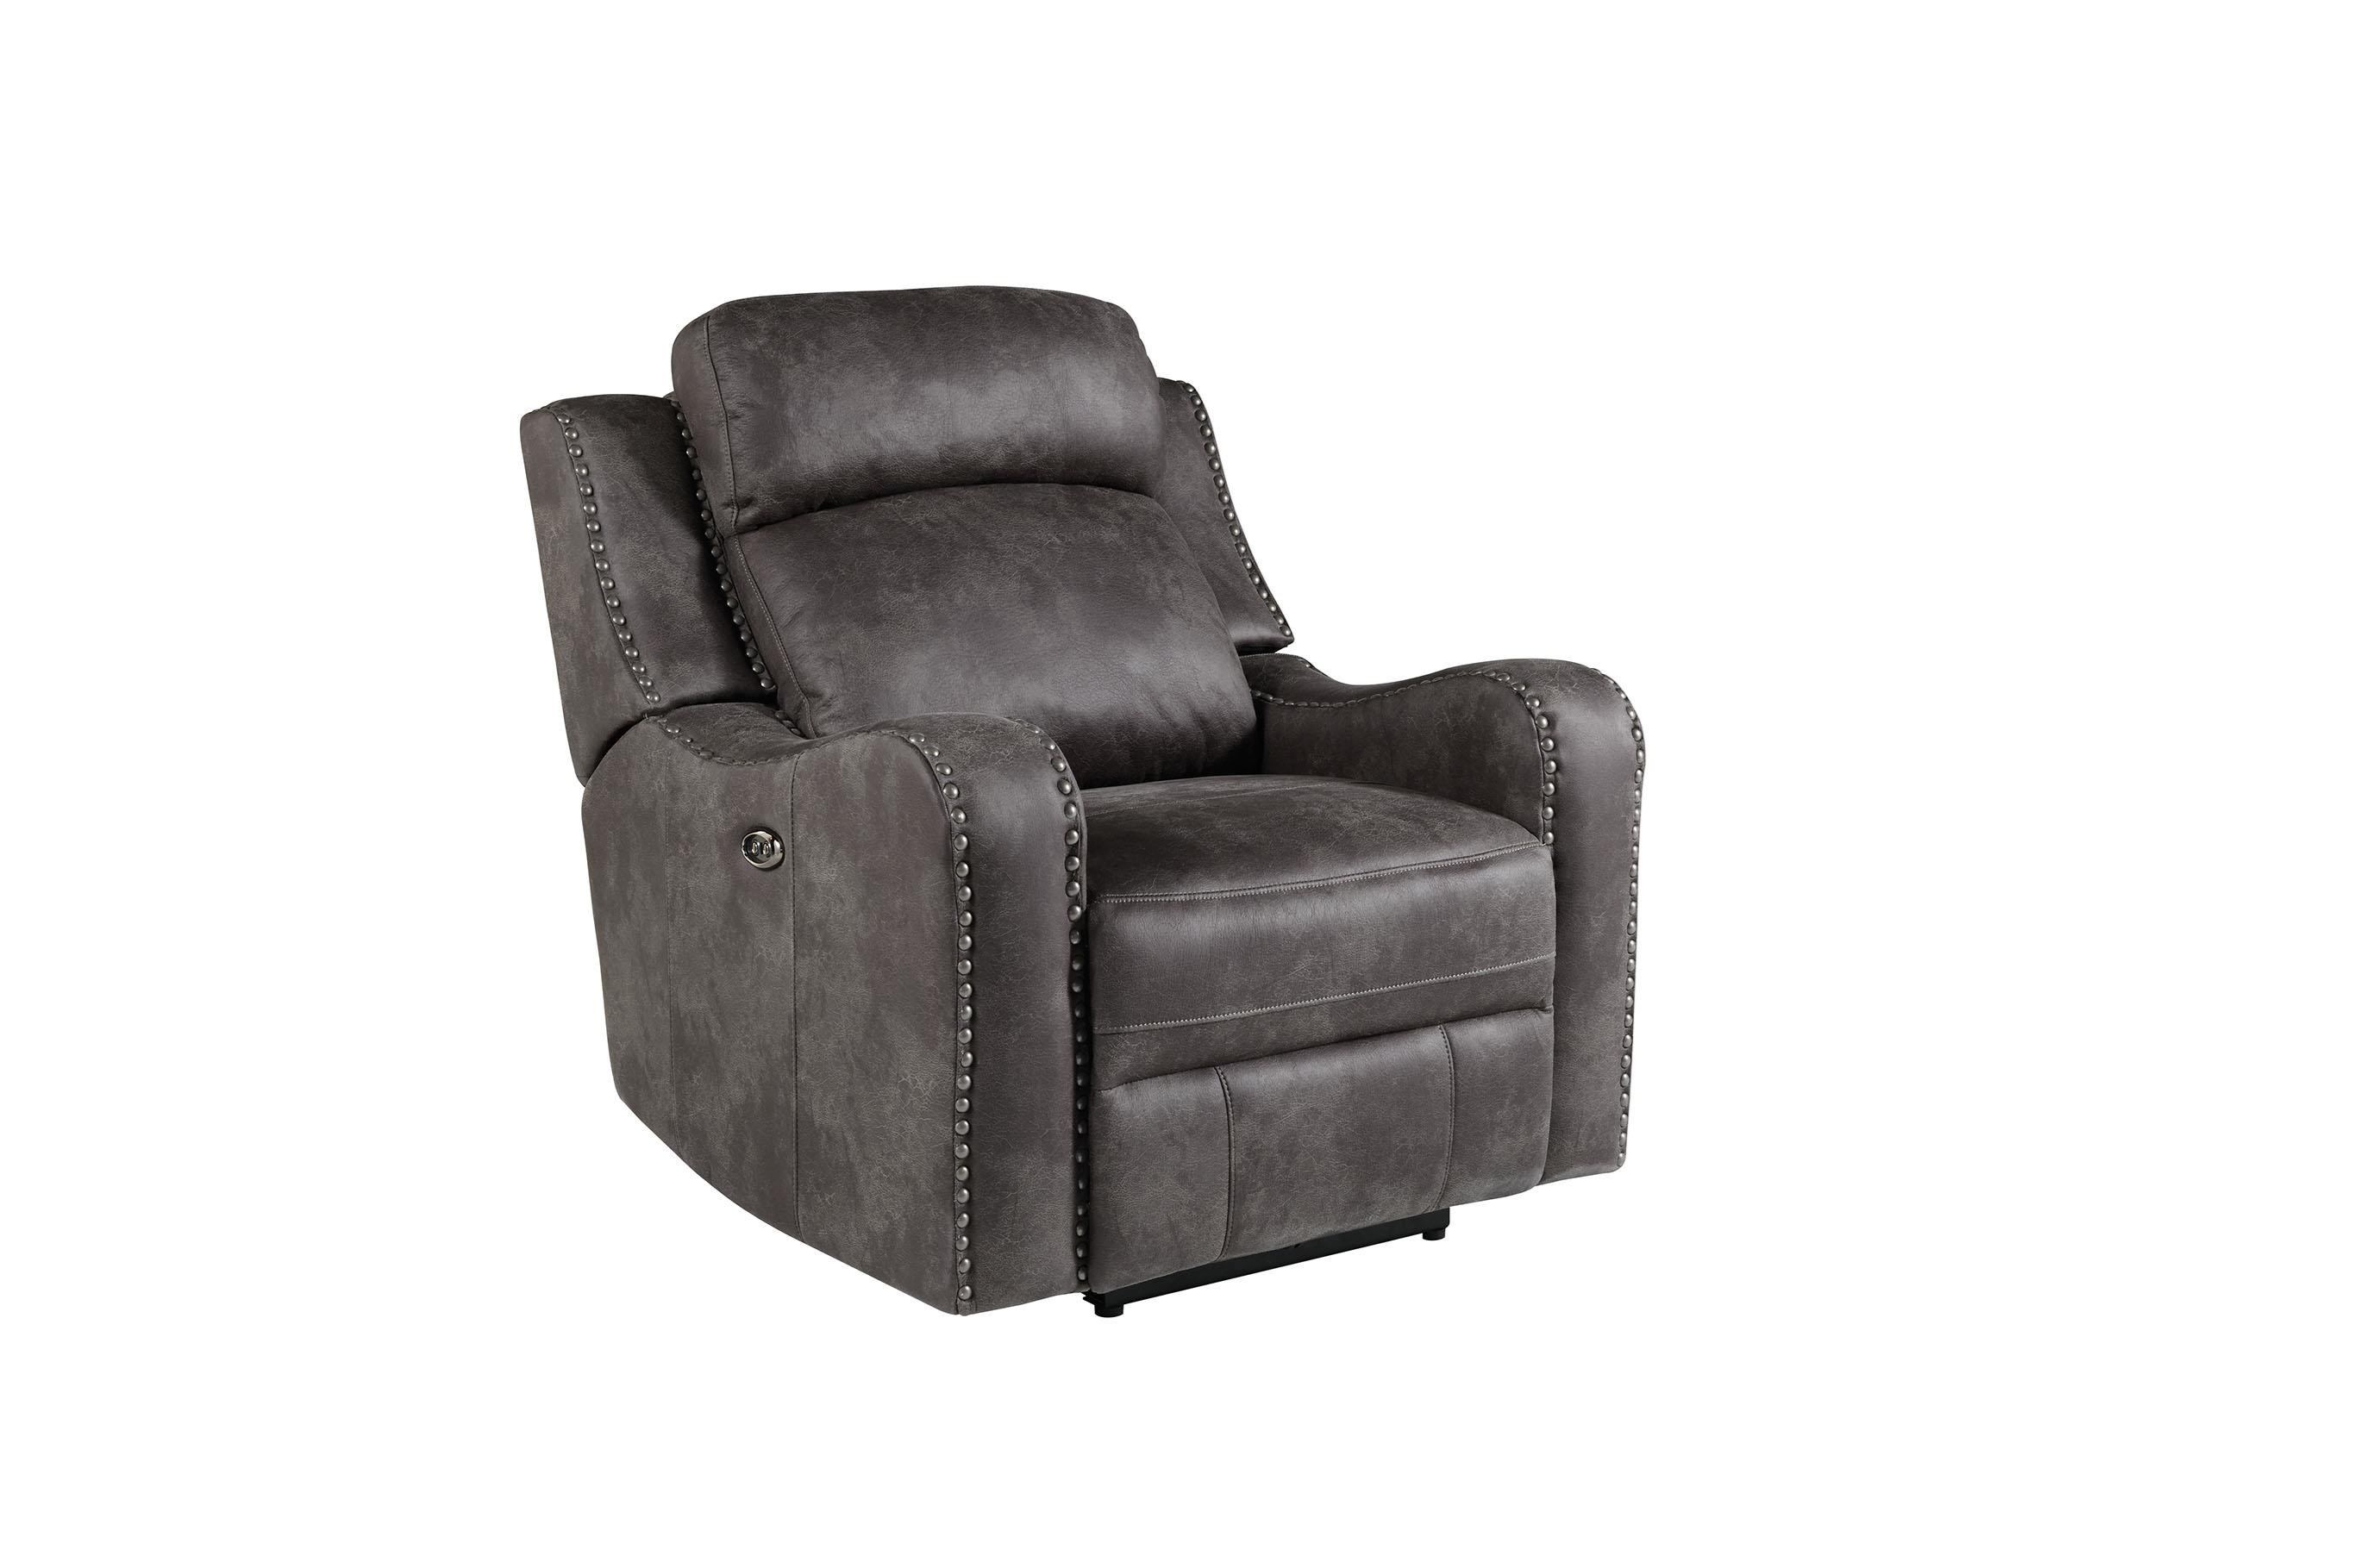 Standard Furniture Bankston Grey Glider Recliner - Item Number: 4148833